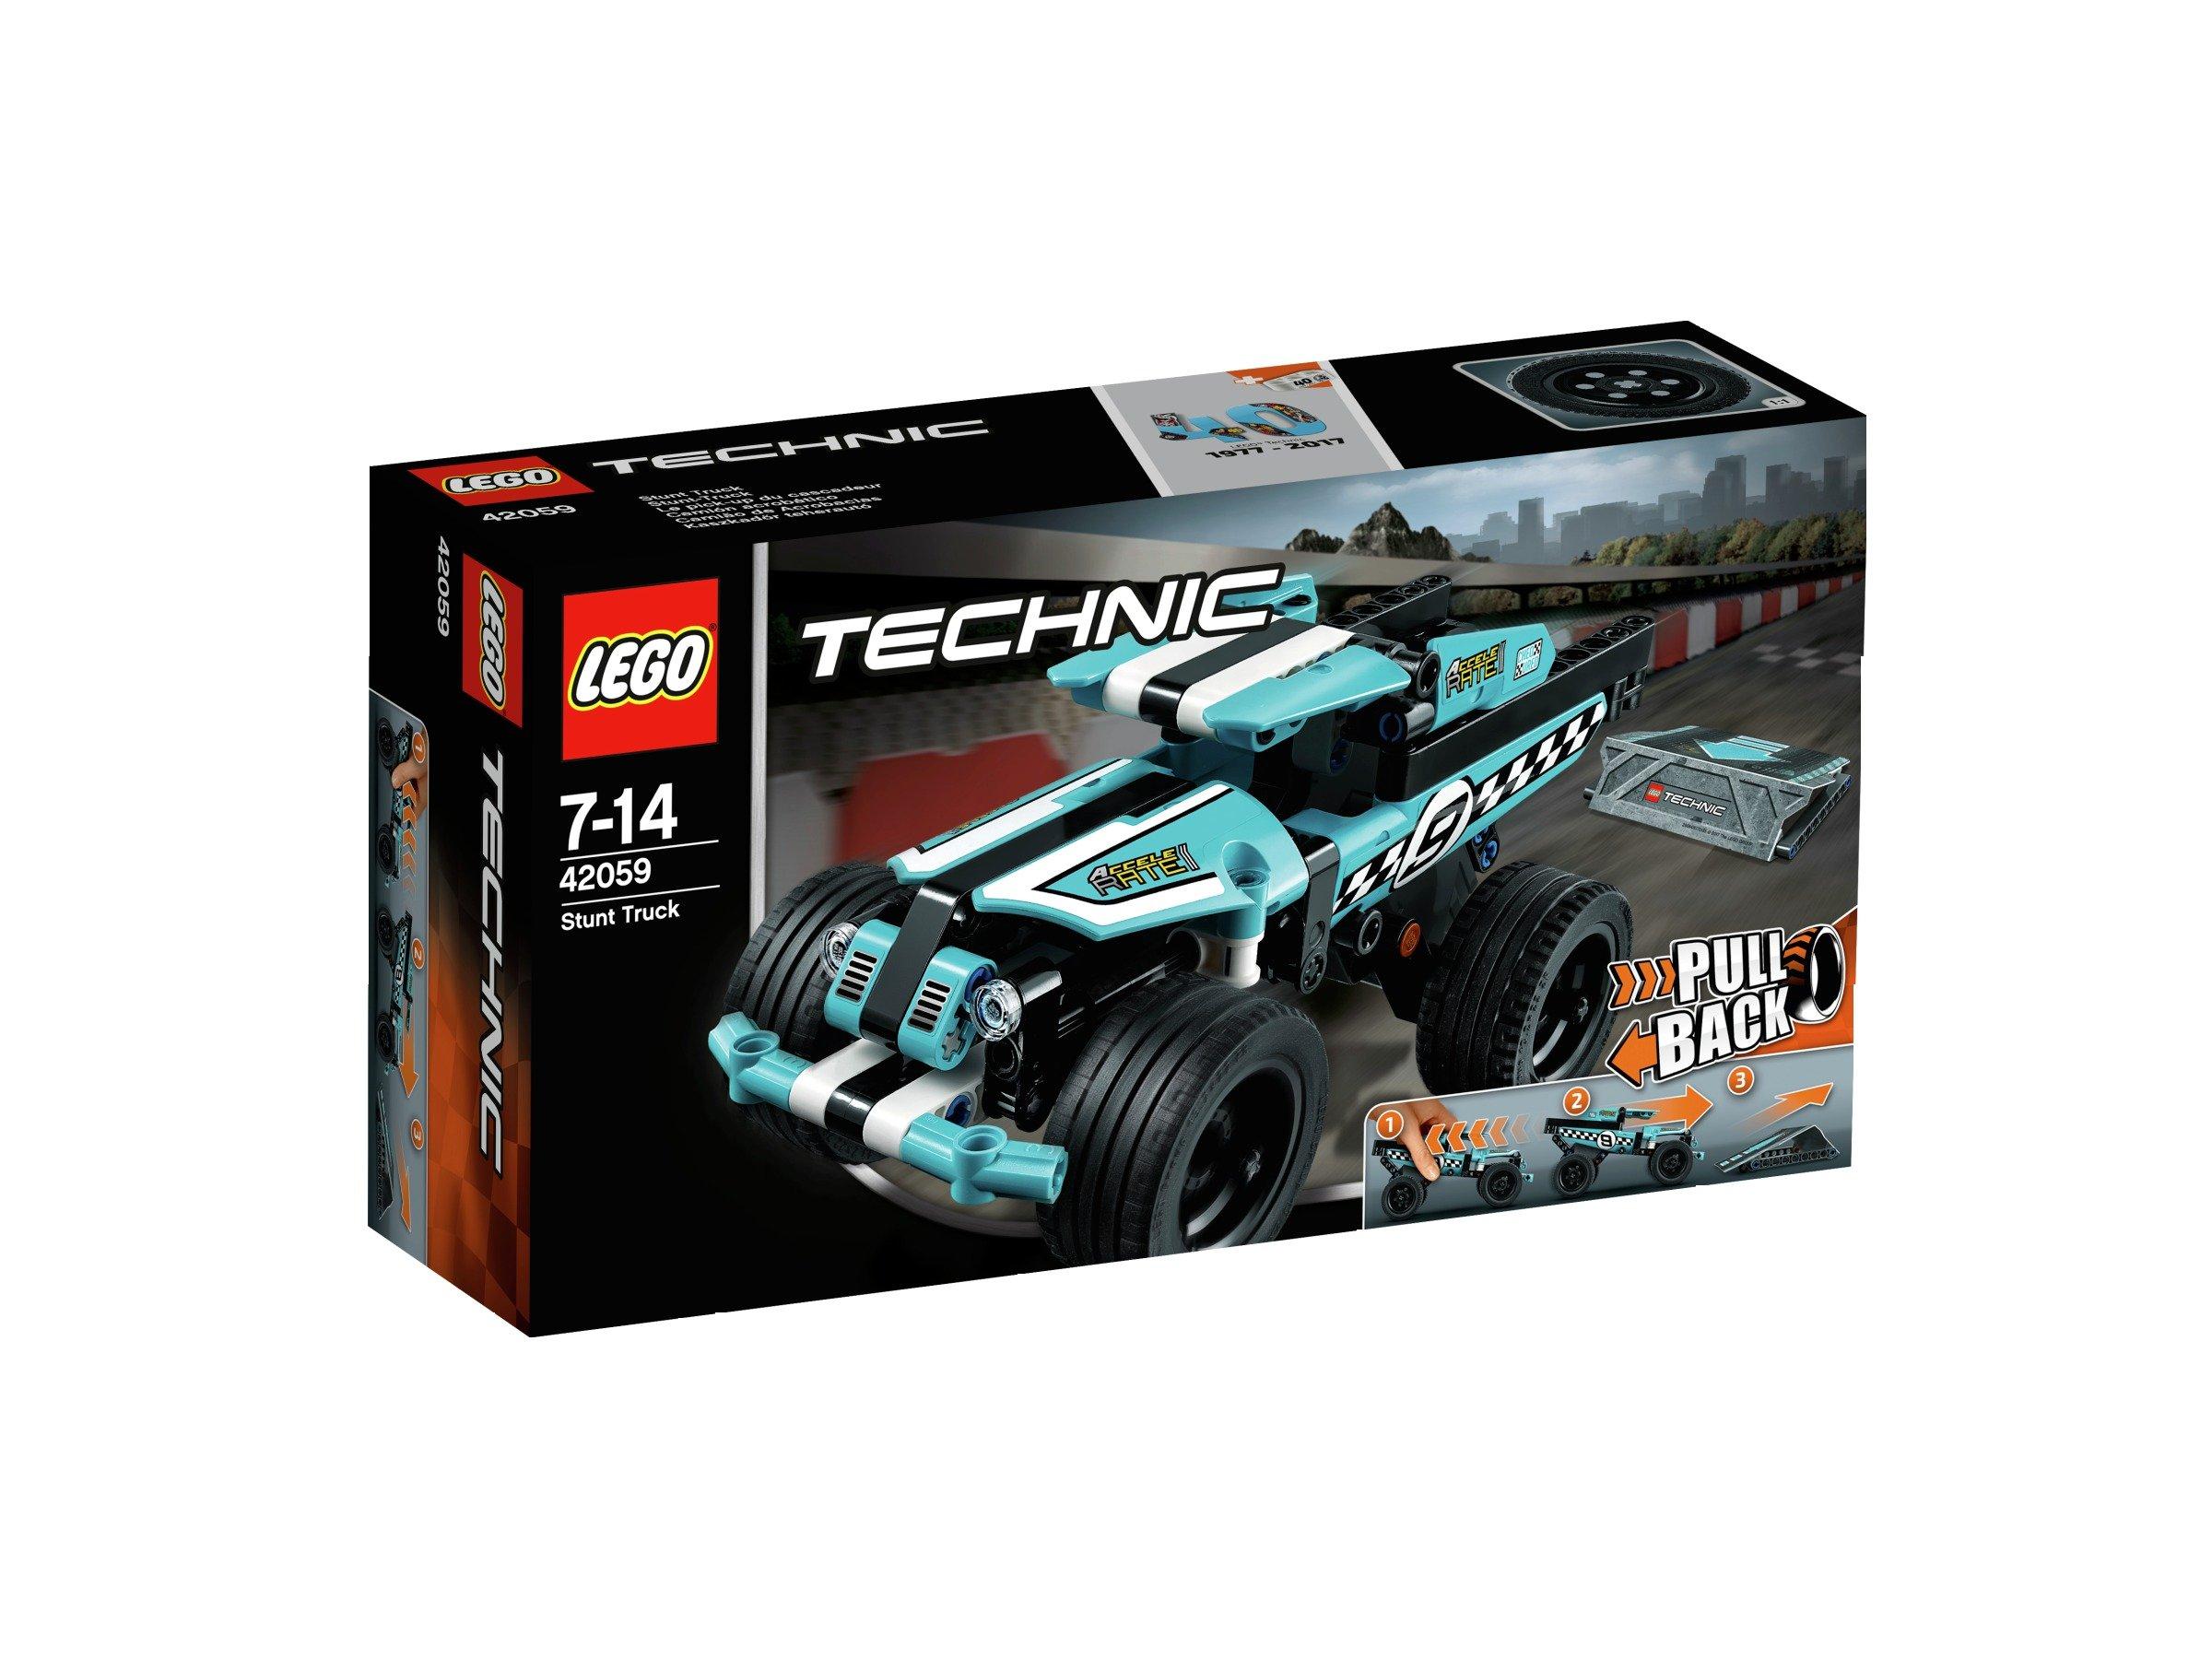 Image of LEGO Technic Stunt Truck -42059.